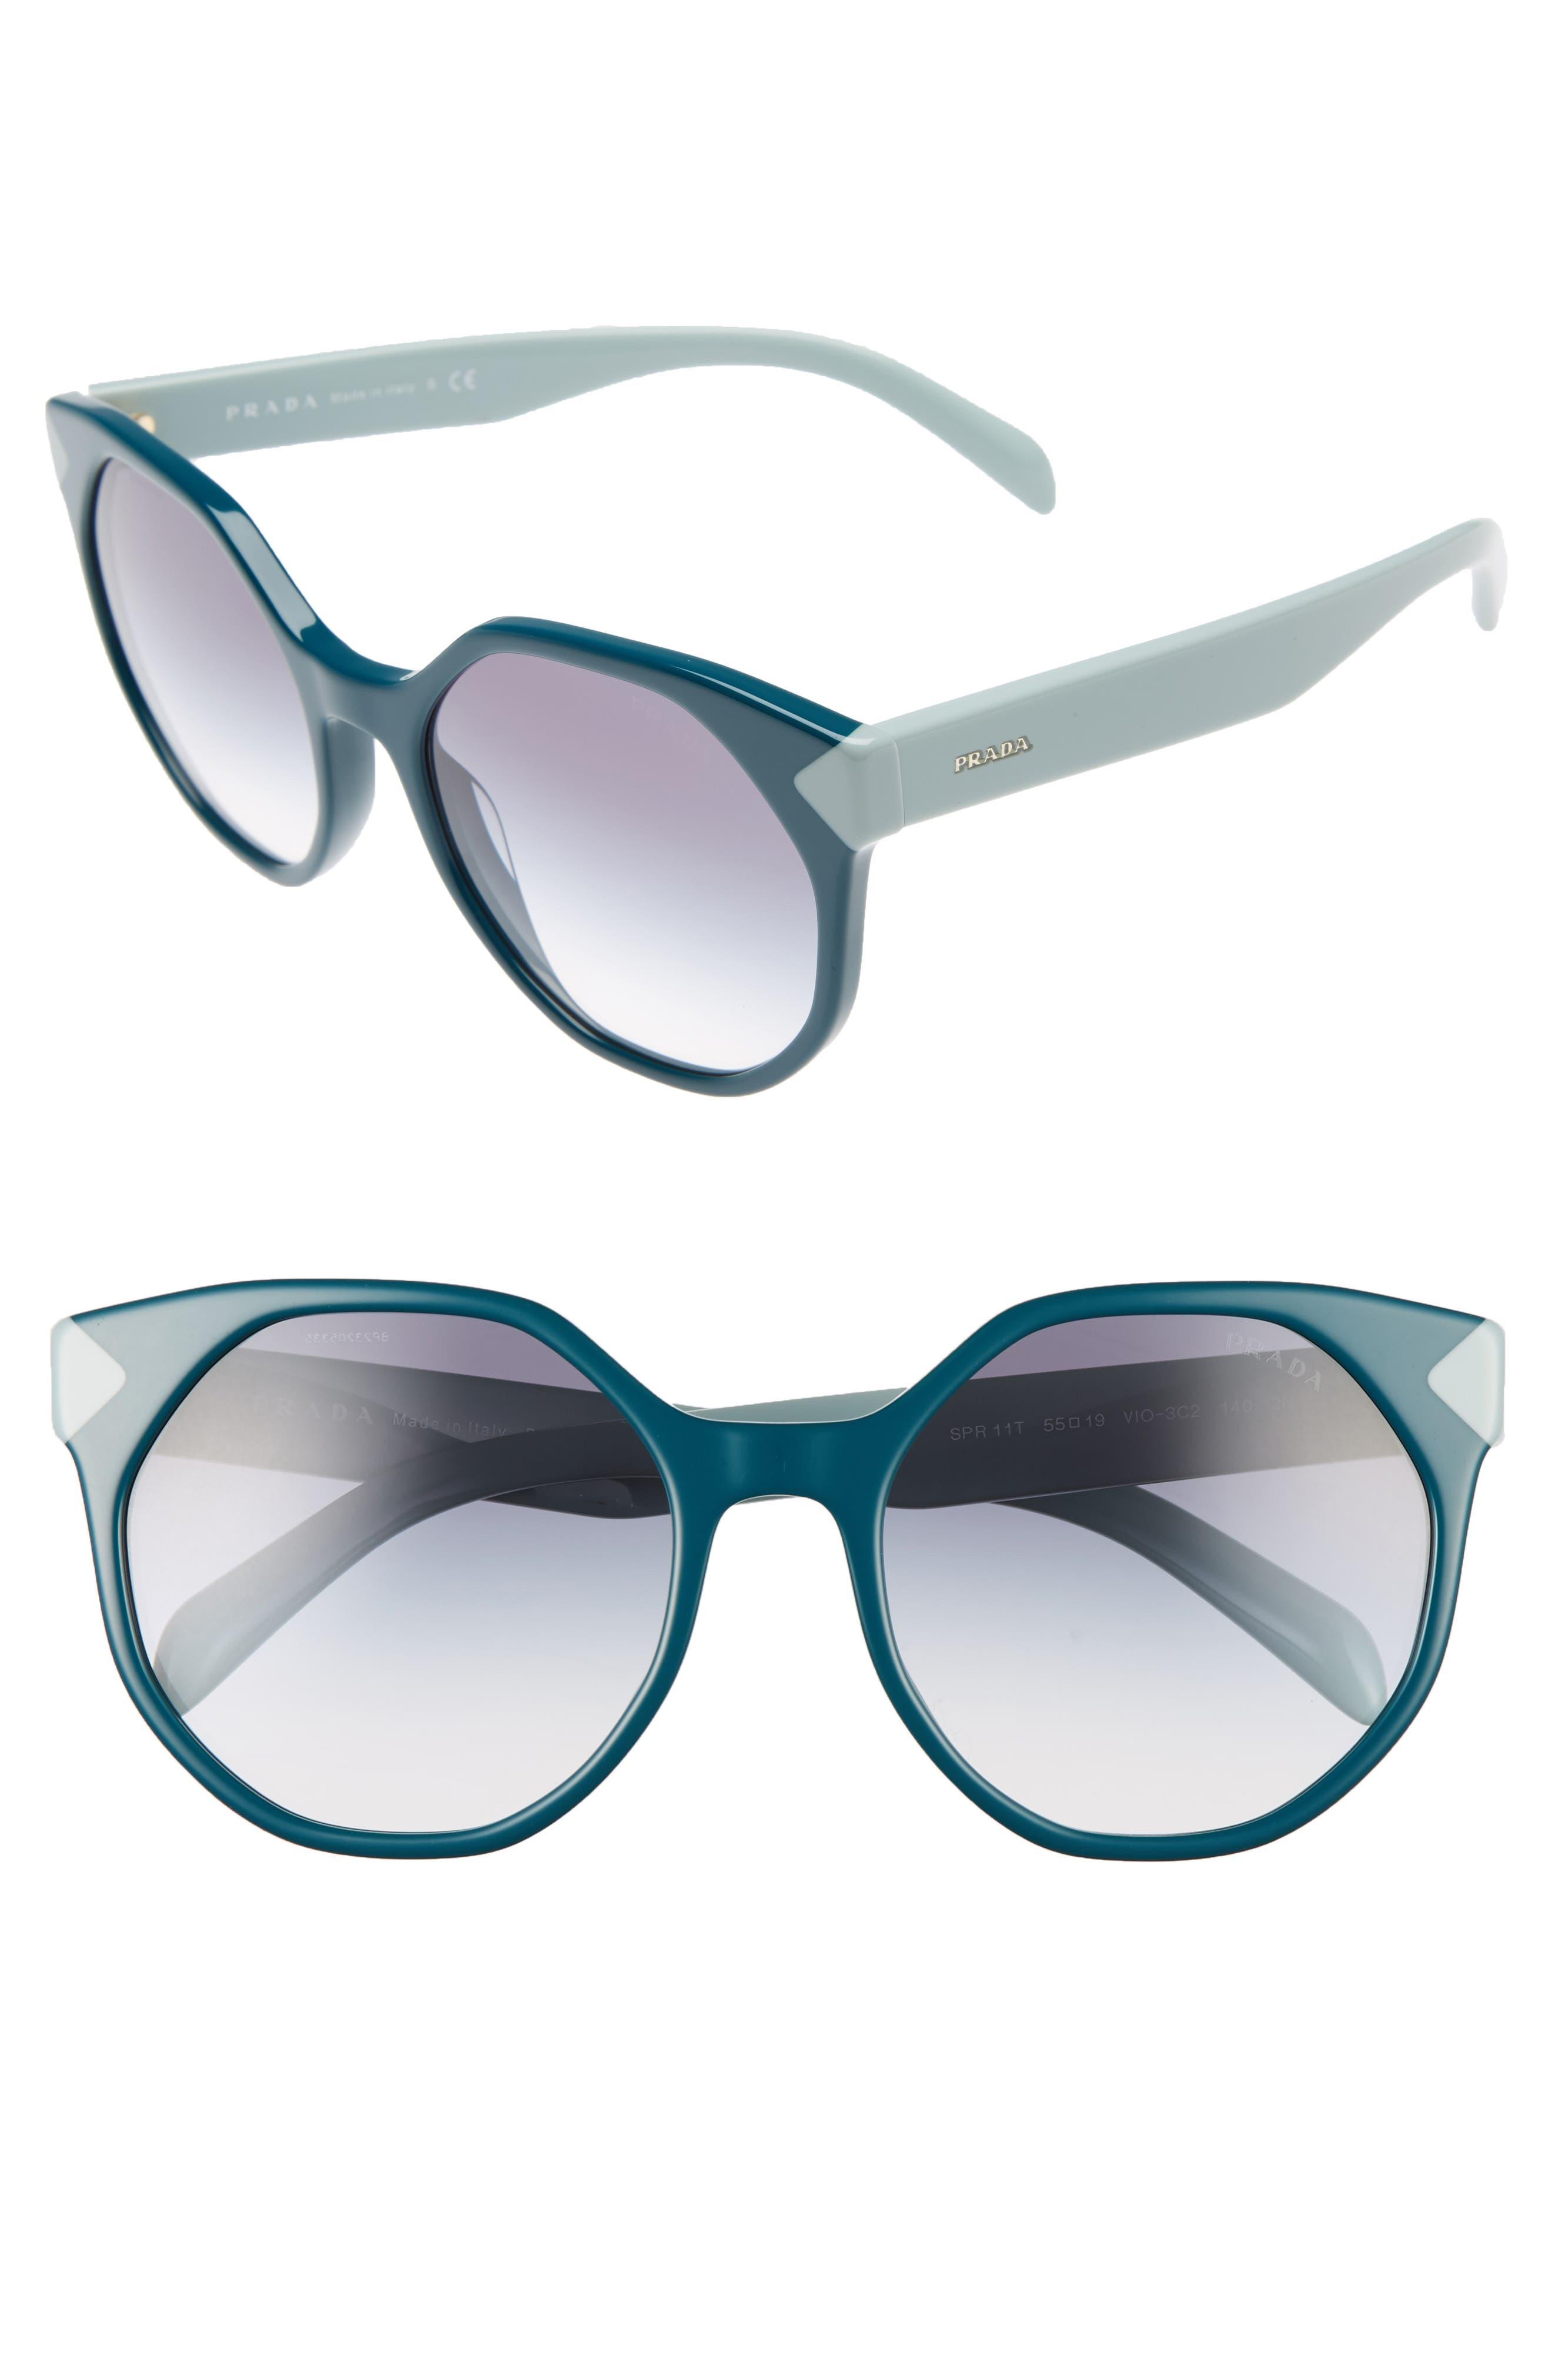 55mm Gradient Geometric Sunglasses,                             Main thumbnail 2, color,